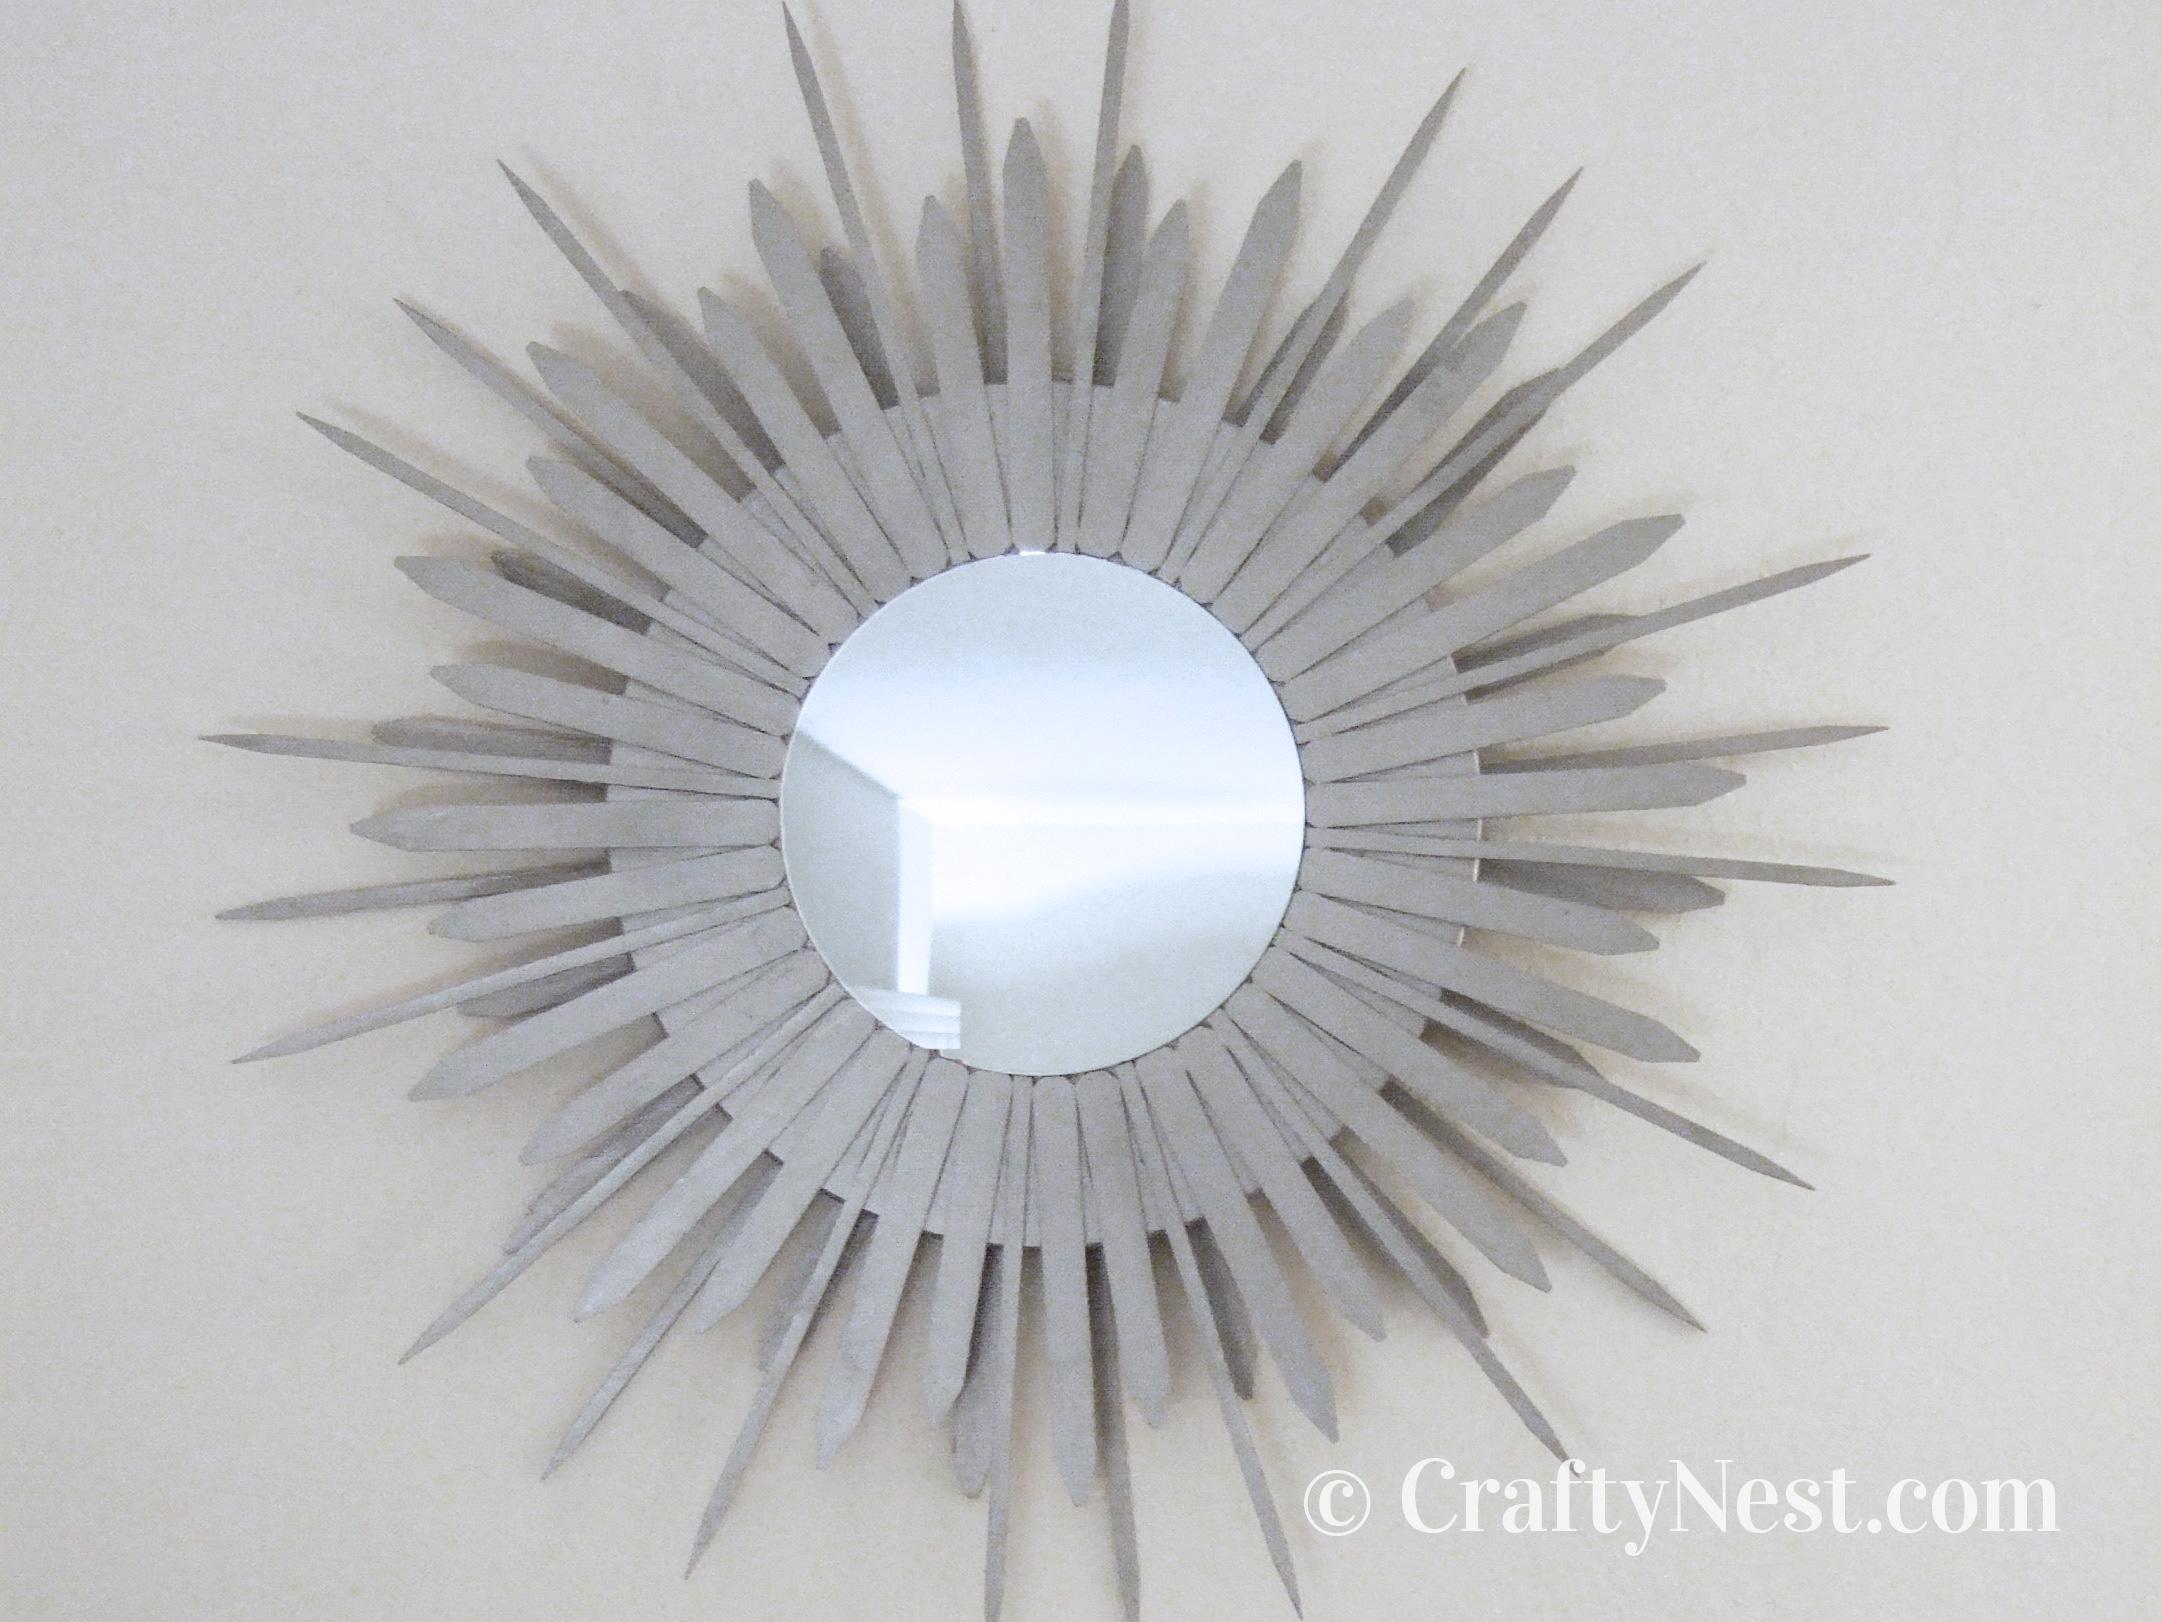 DIY starburst mirror on the wall, photo